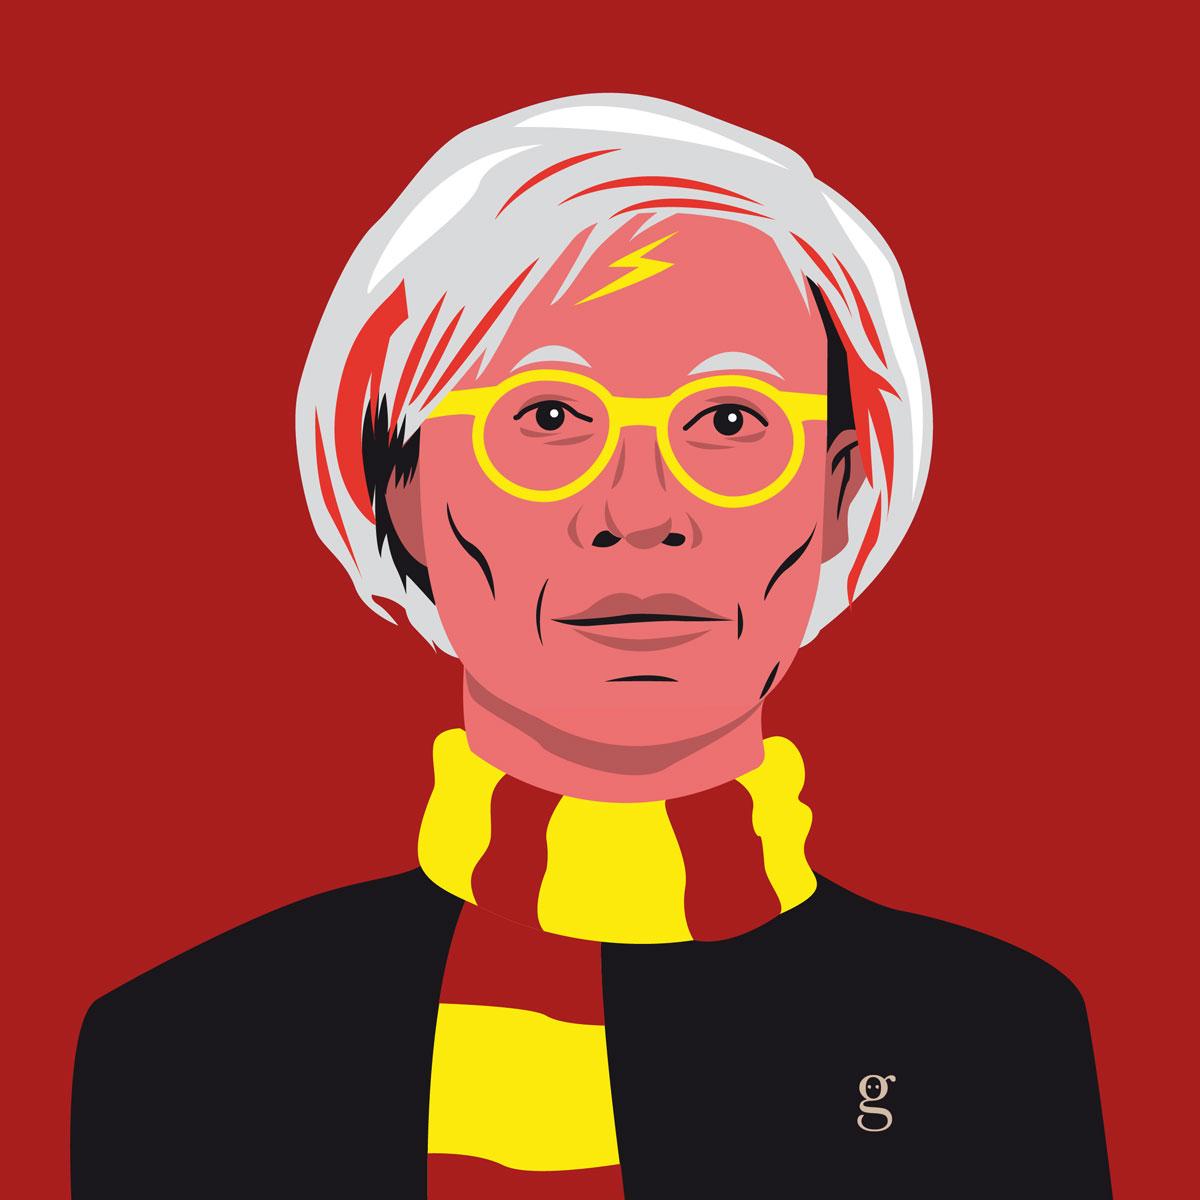 Mashup Andy Warhol x Harry Potter (vector illustration) - variante Gryffondor